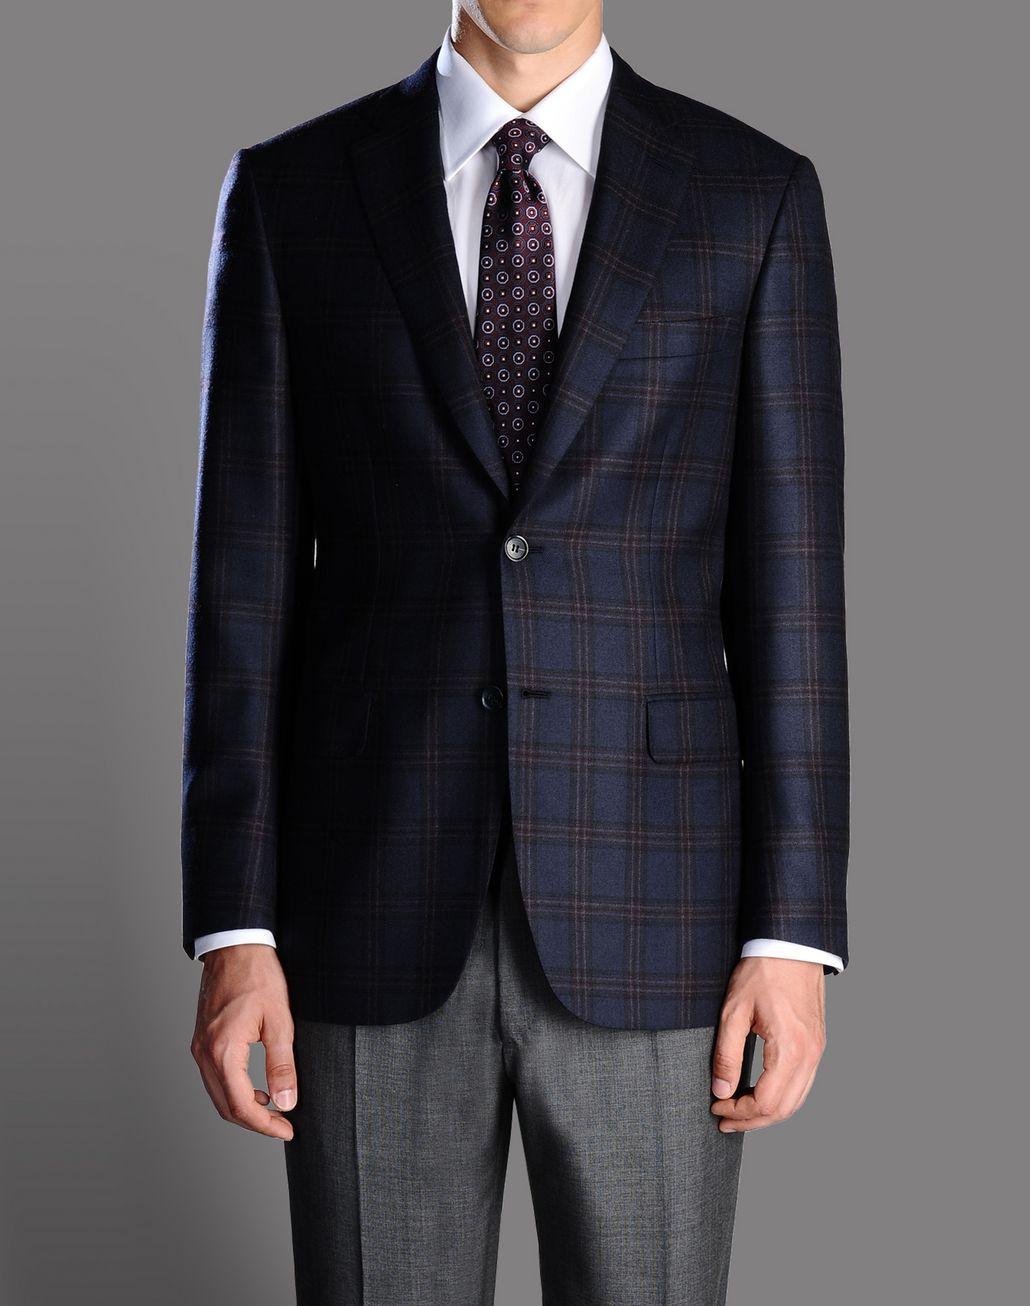 BRIONI Two-button jacket Suits & Jackets U f